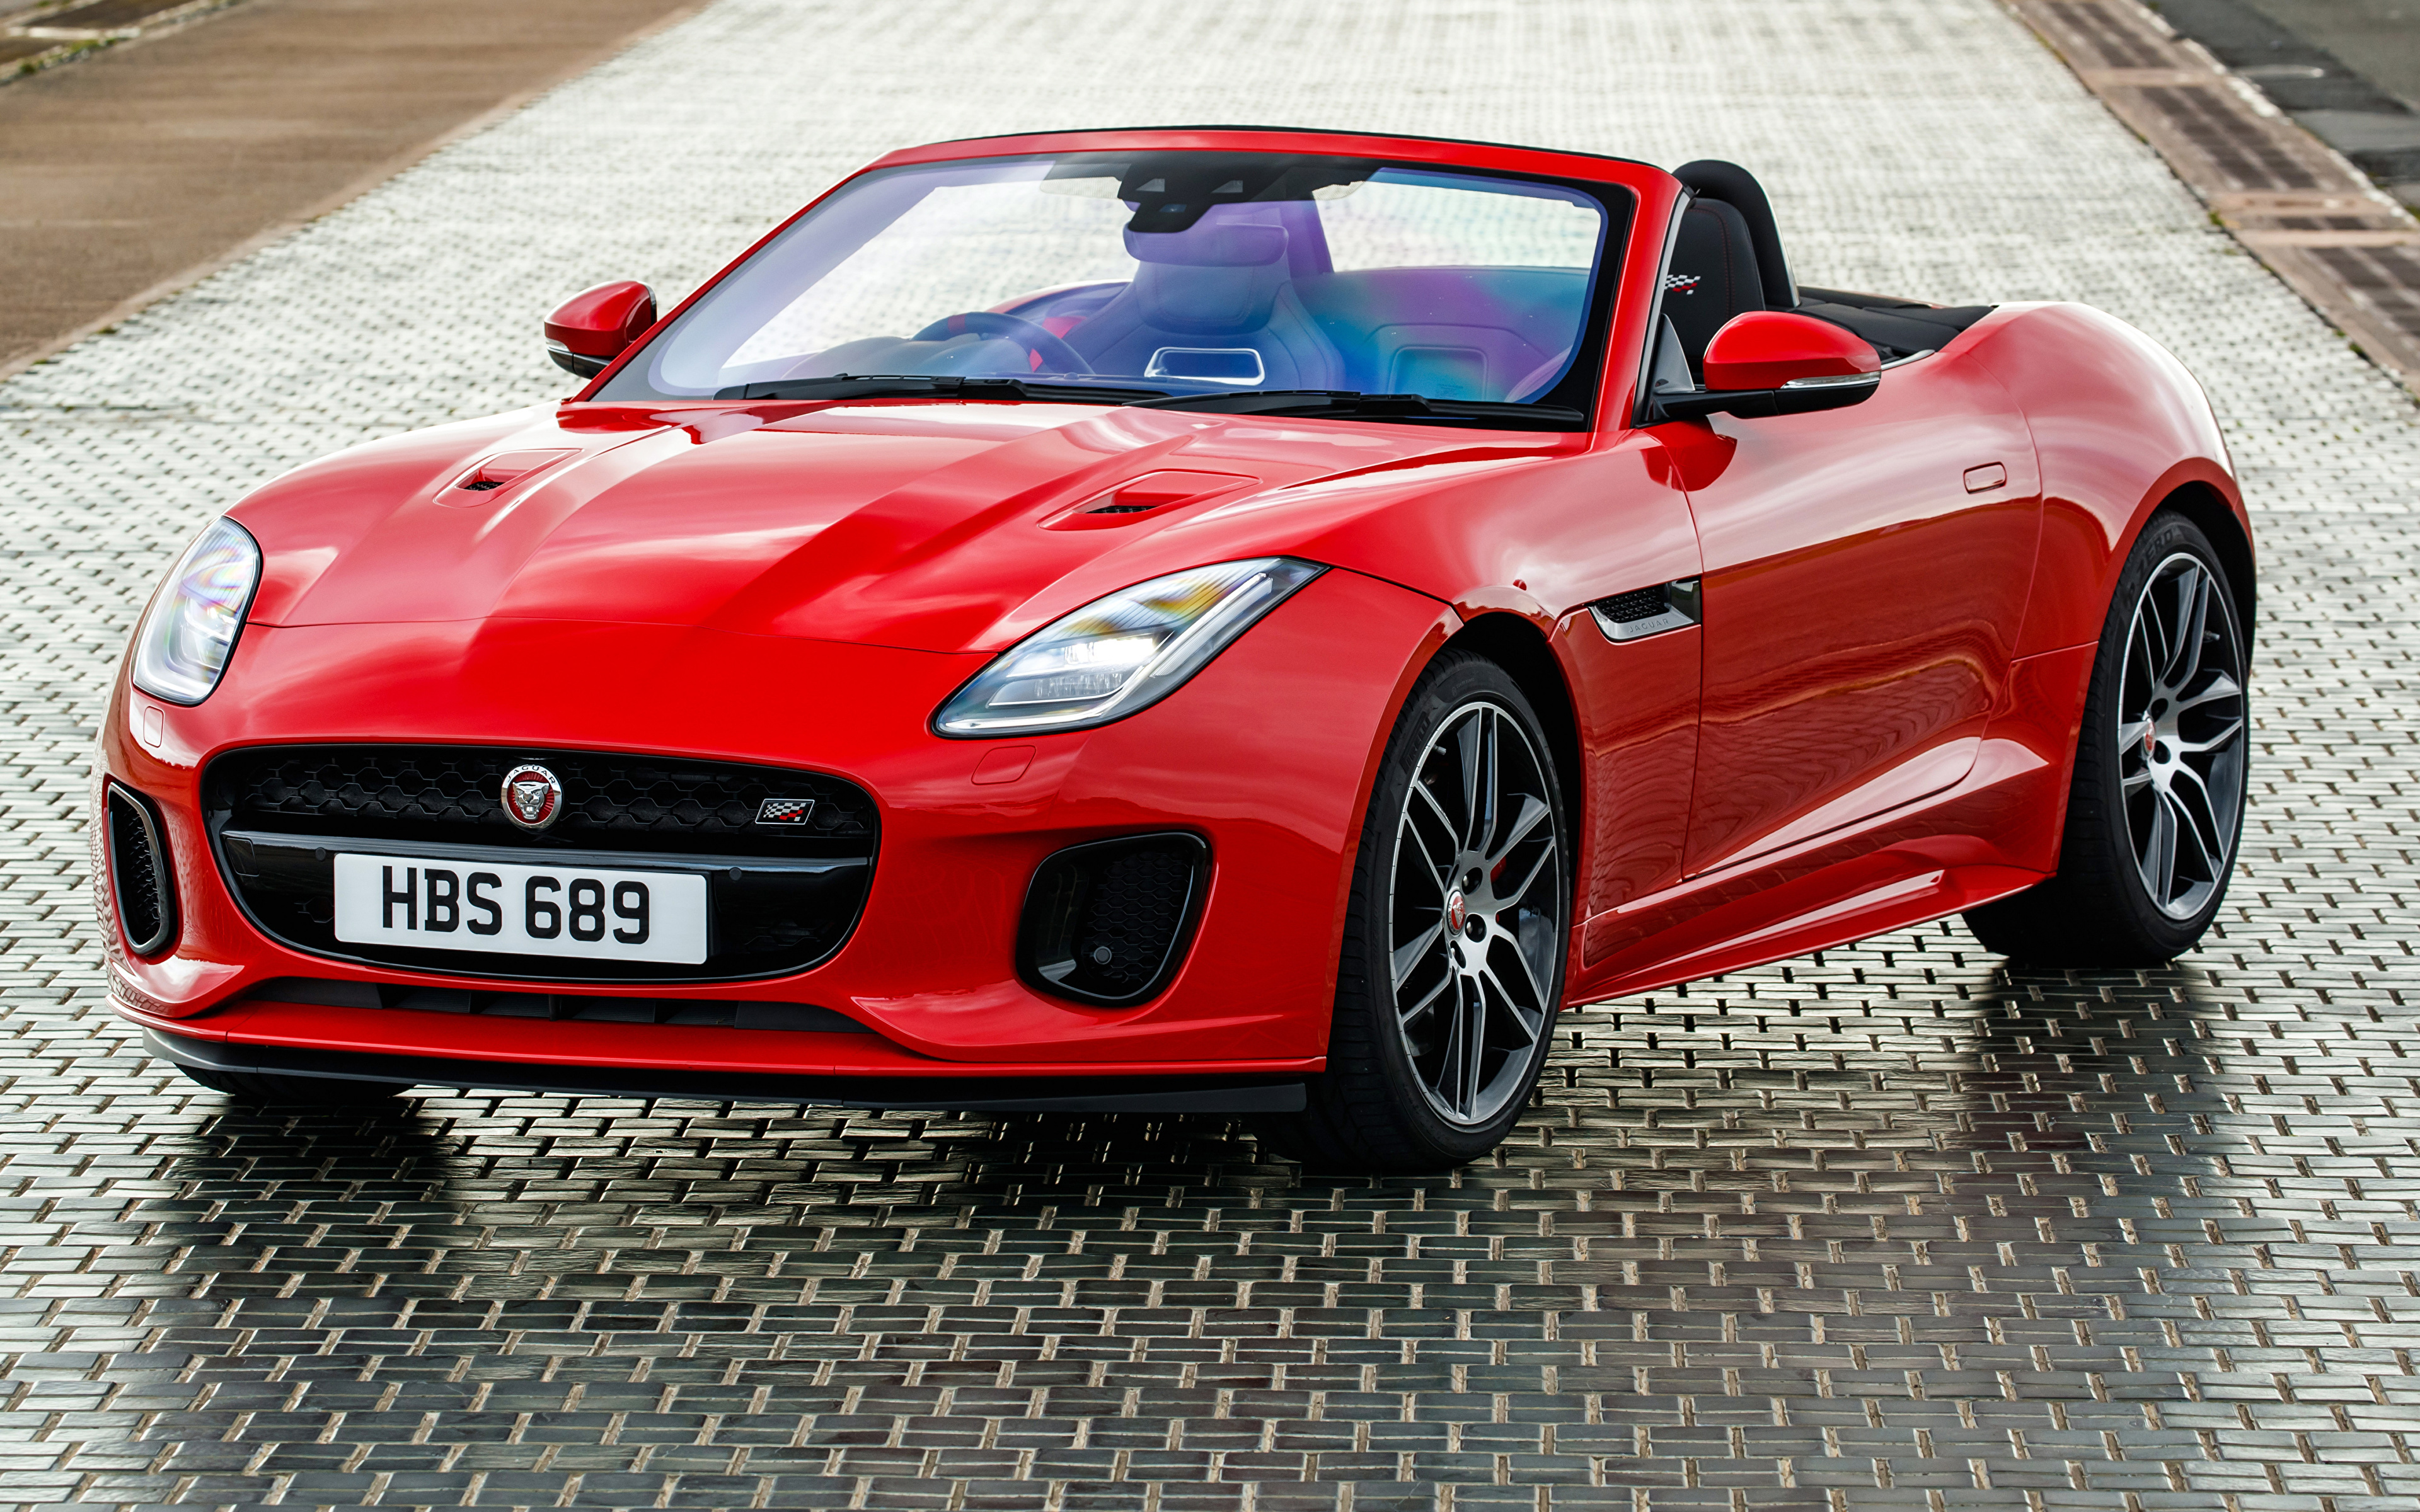 Обои Ягуар 2018-19 F-Type  Chequered Flag  Convertible Кабриолет красные Авто Металлик 3840x2400 Jaguar кабриолета красных Красный красная Машины Автомобили